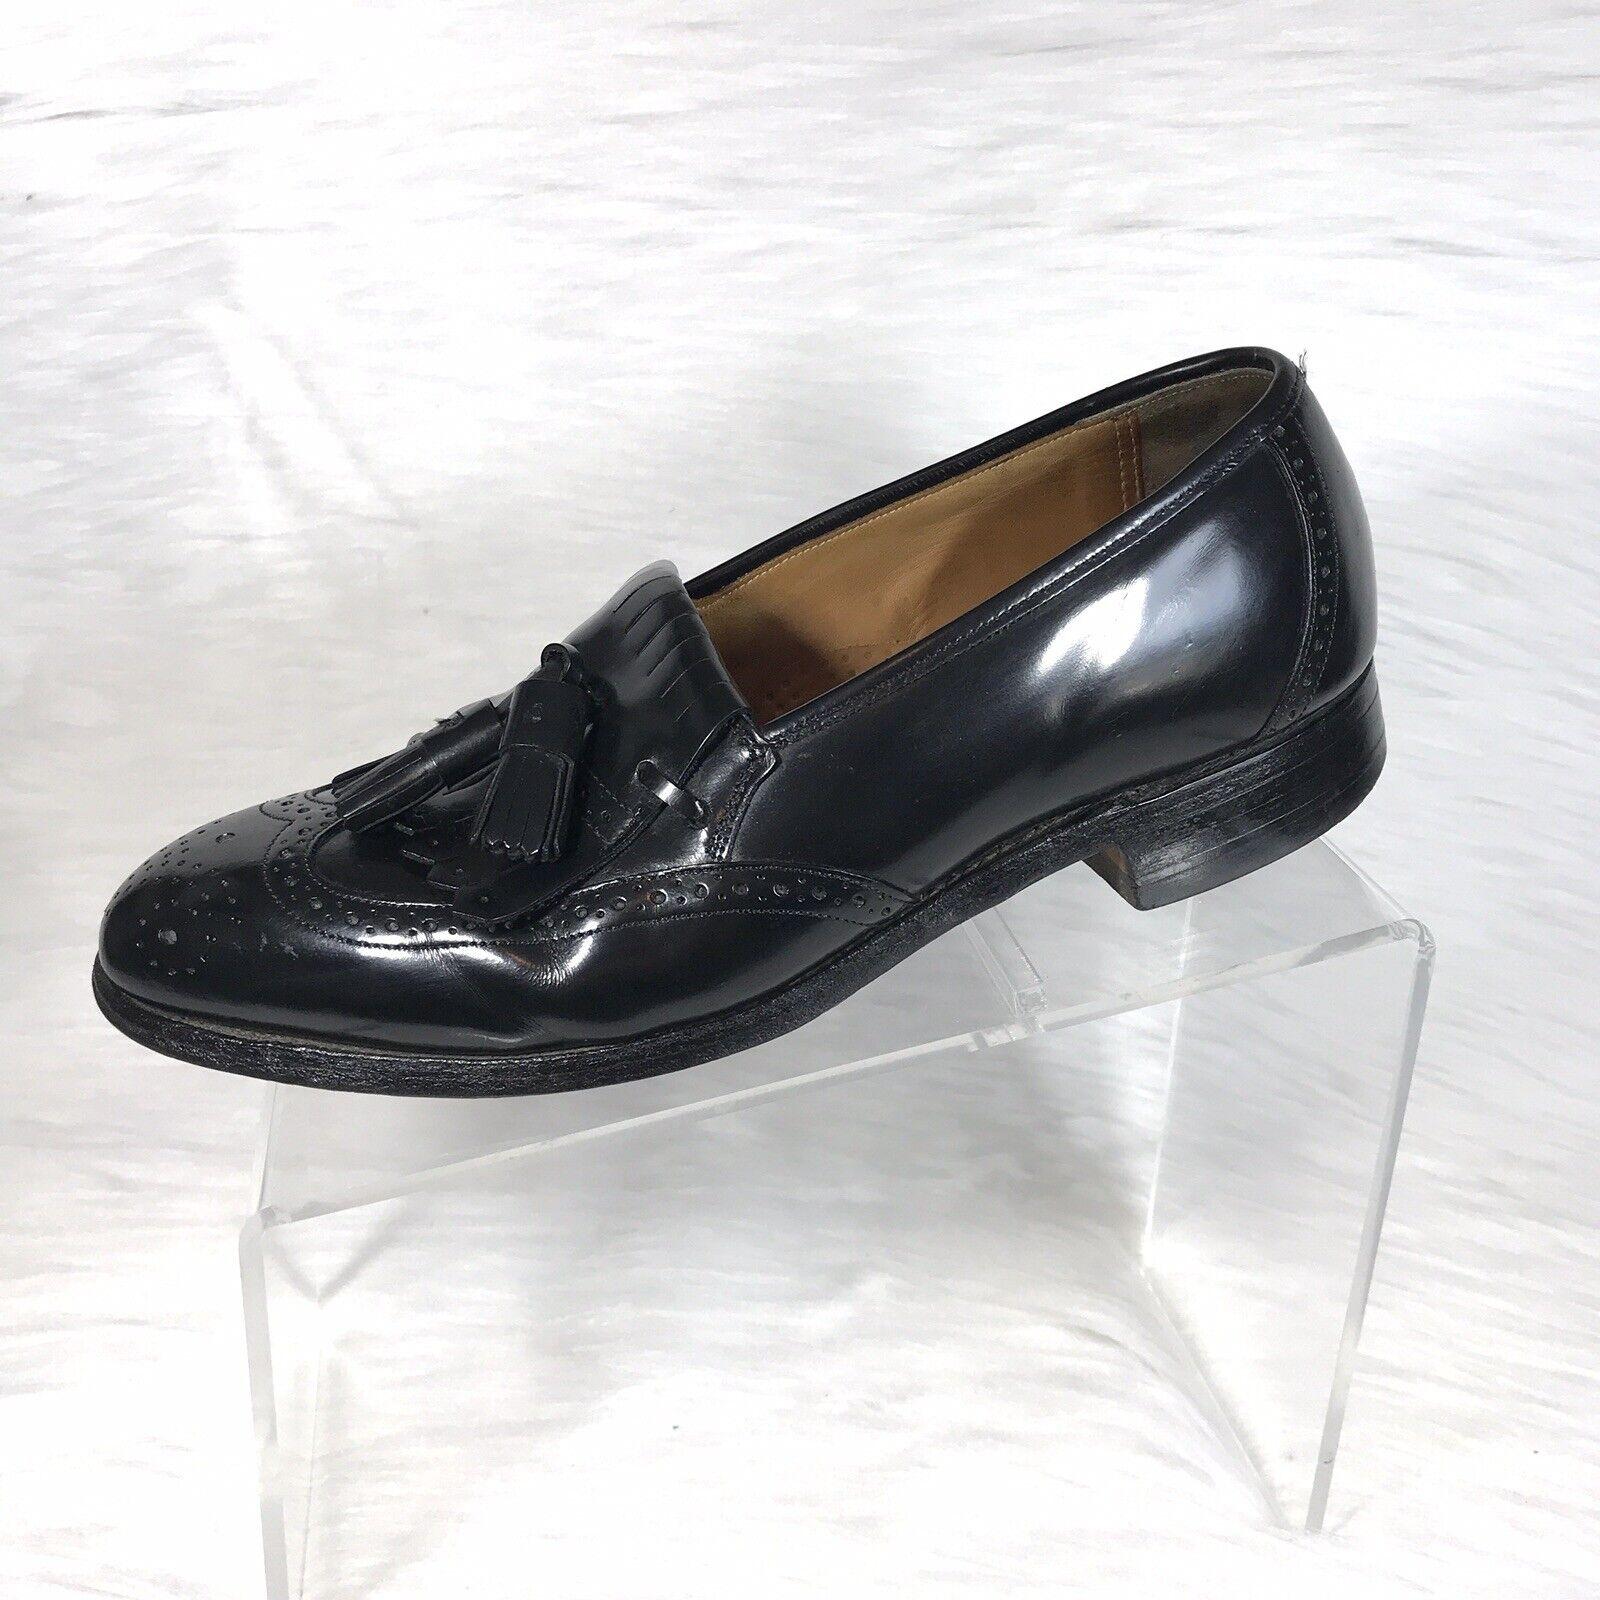 Johnston Murphy Men's Tassel Loafers Black Wingtip Size 8 D